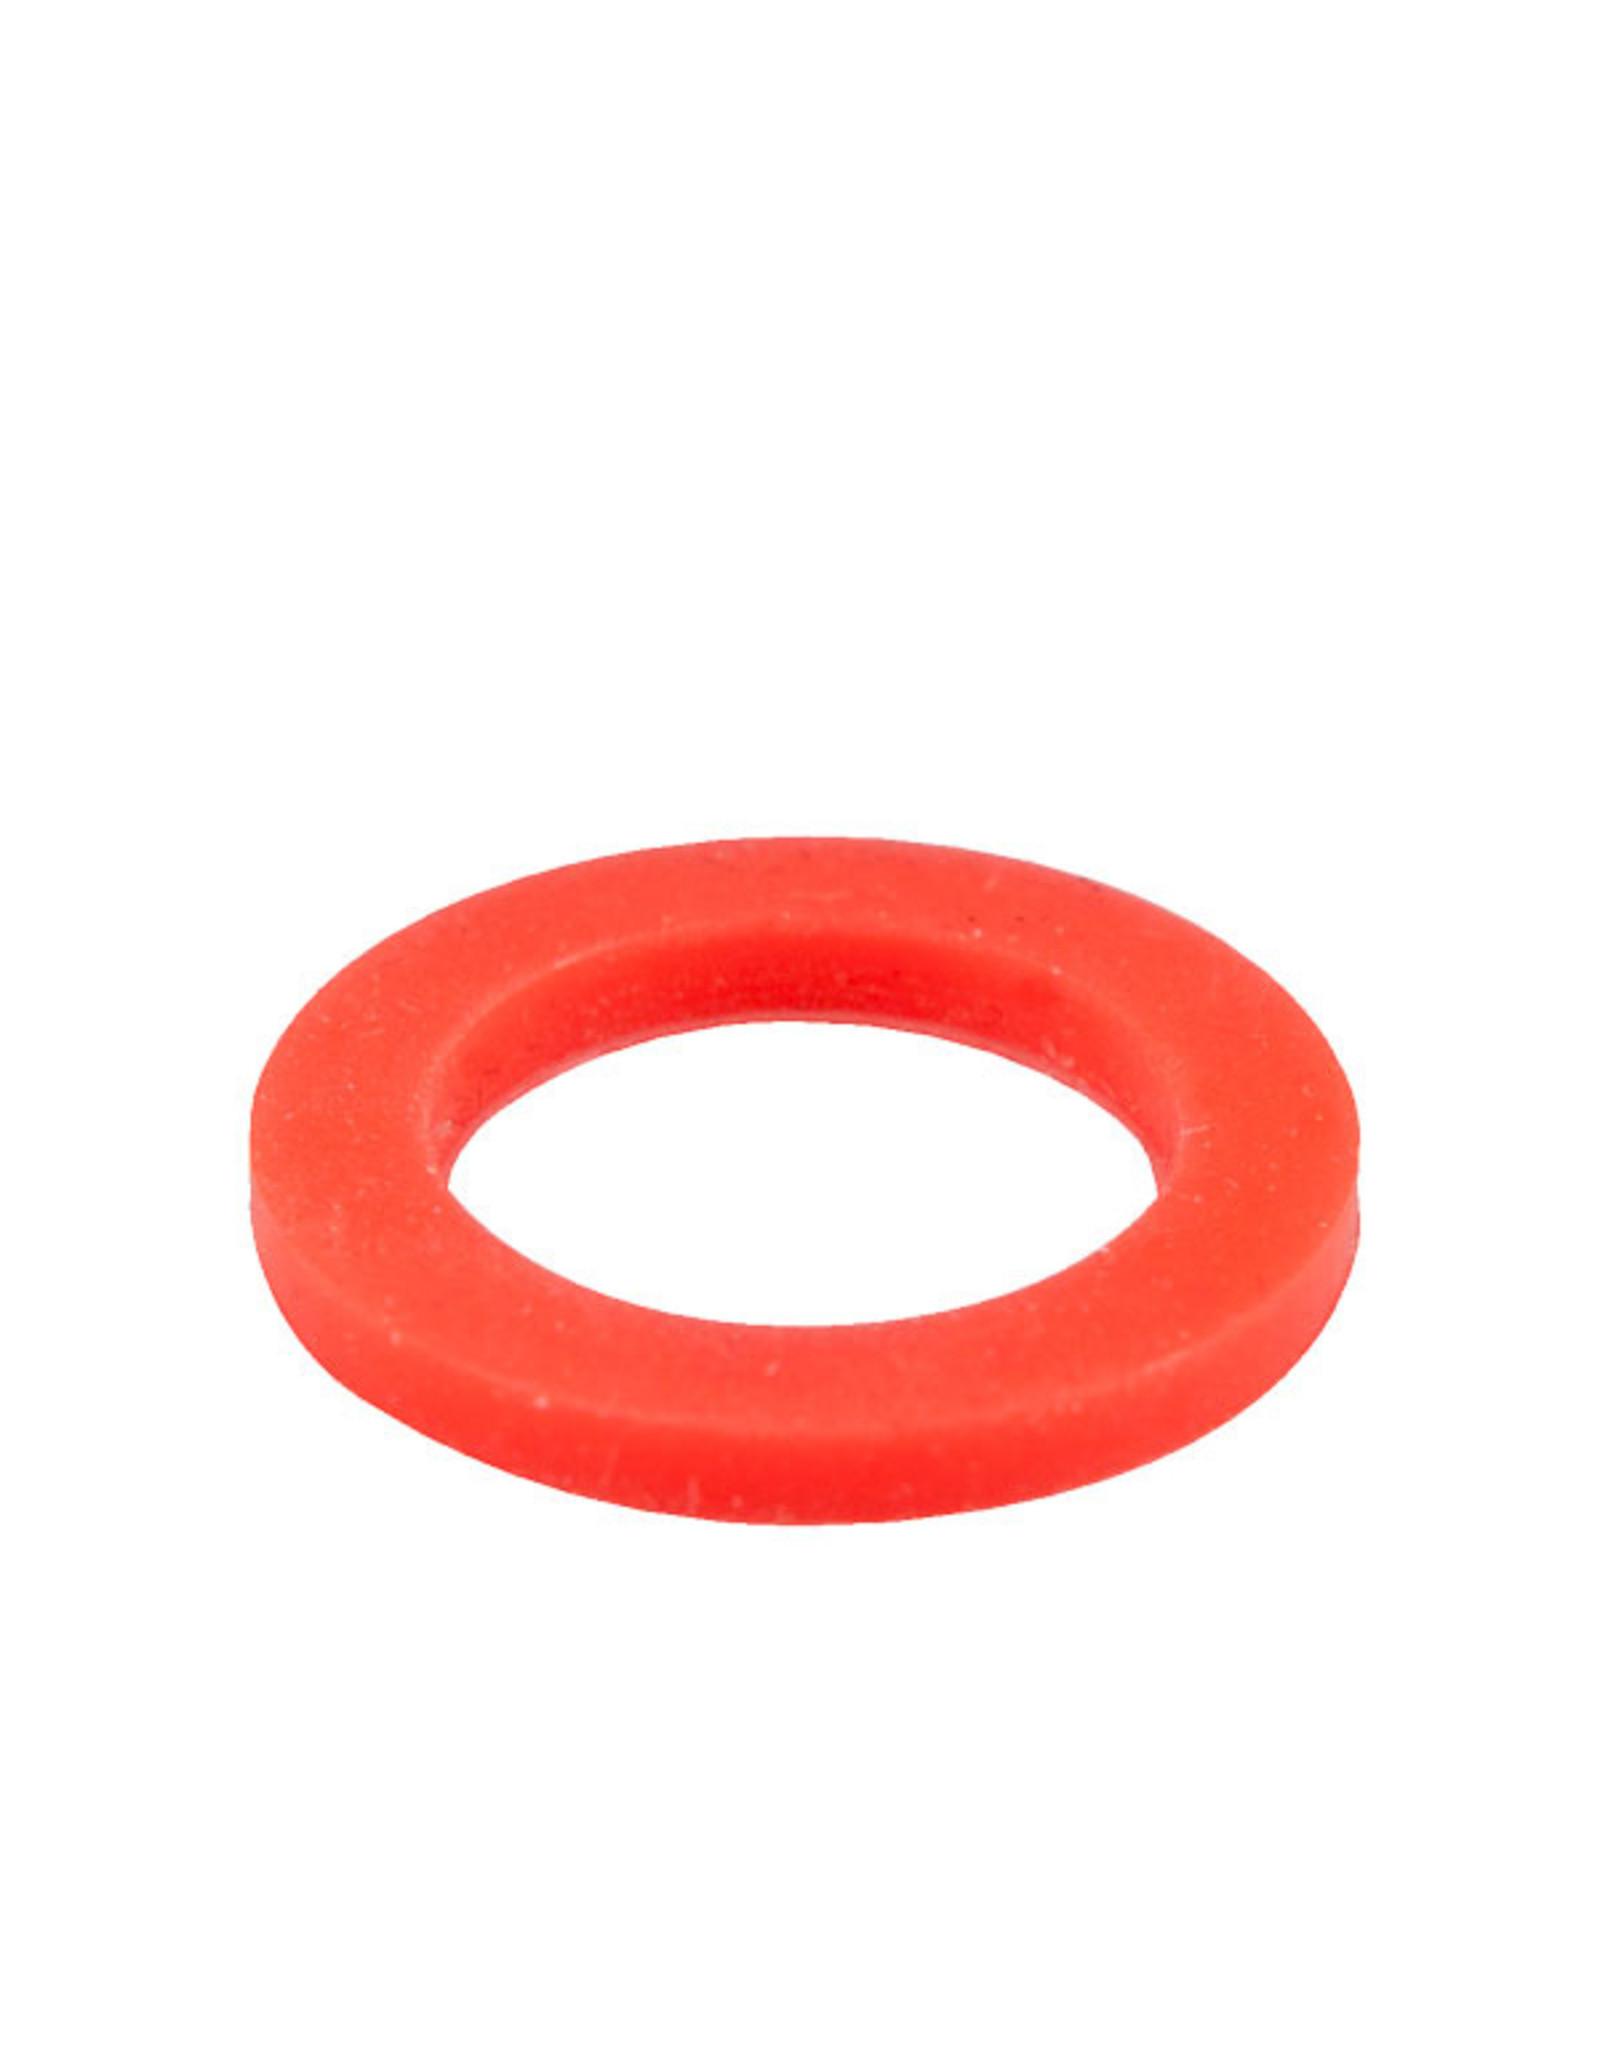 Flat O-Ring Silicone